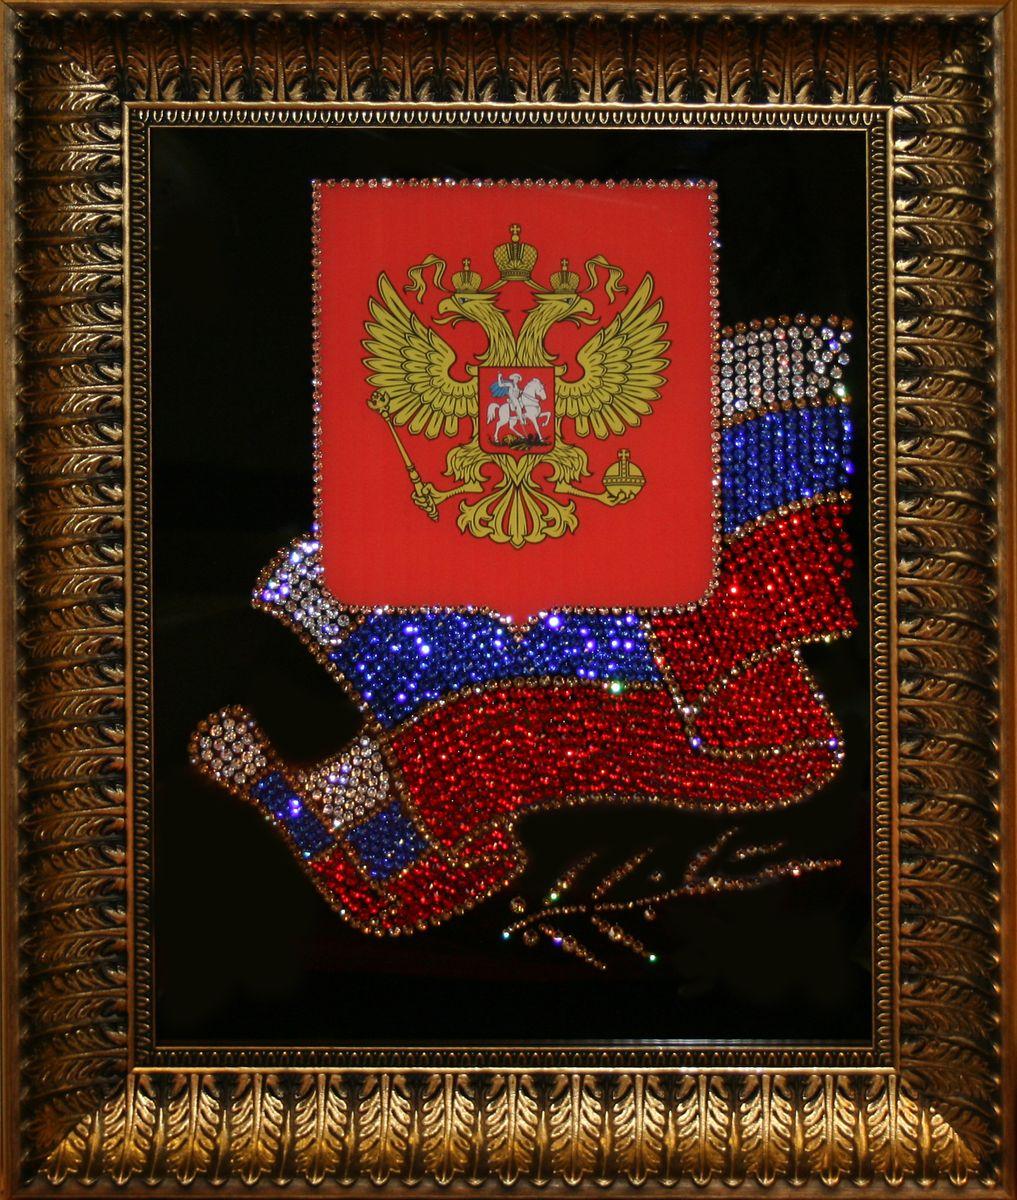 1399 Картина Сваровски Флаг и герб РФ1399стекло, хрусталь, пластик. 43х53